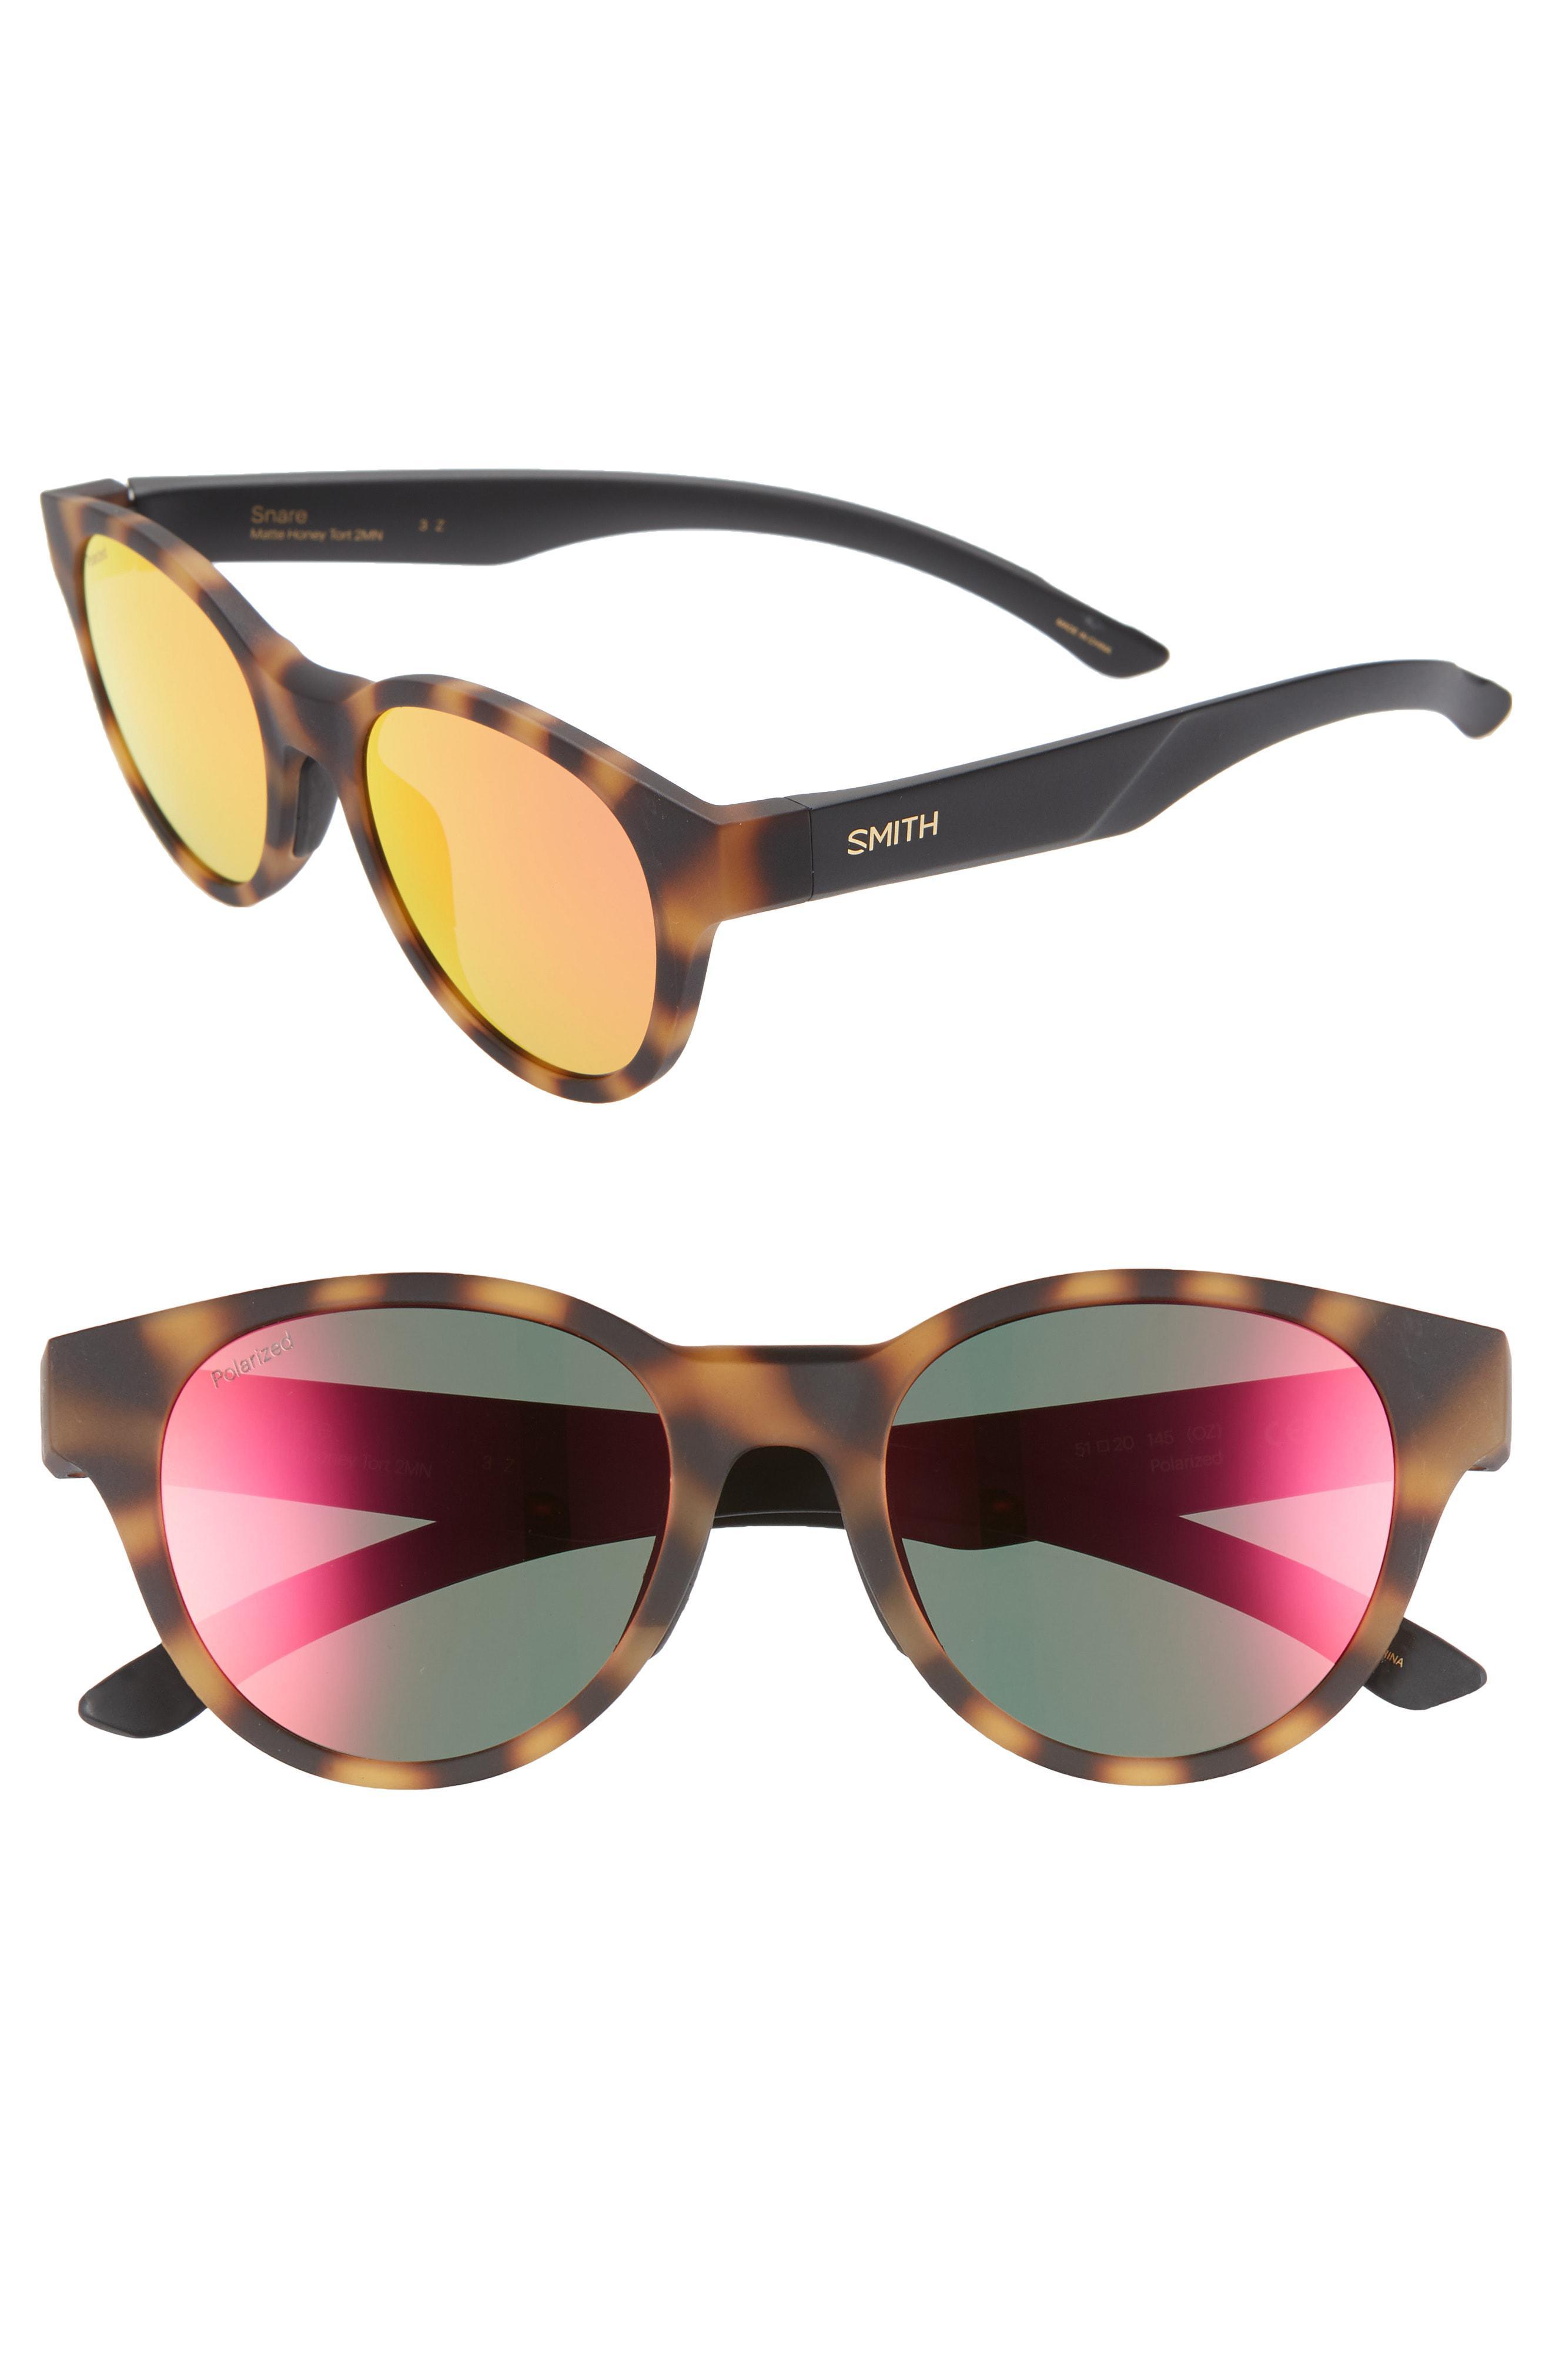 6535c619103 Smith - Gray Snare 51mm Polarized Matte Round Sunglasses - Lyst. View  fullscreen